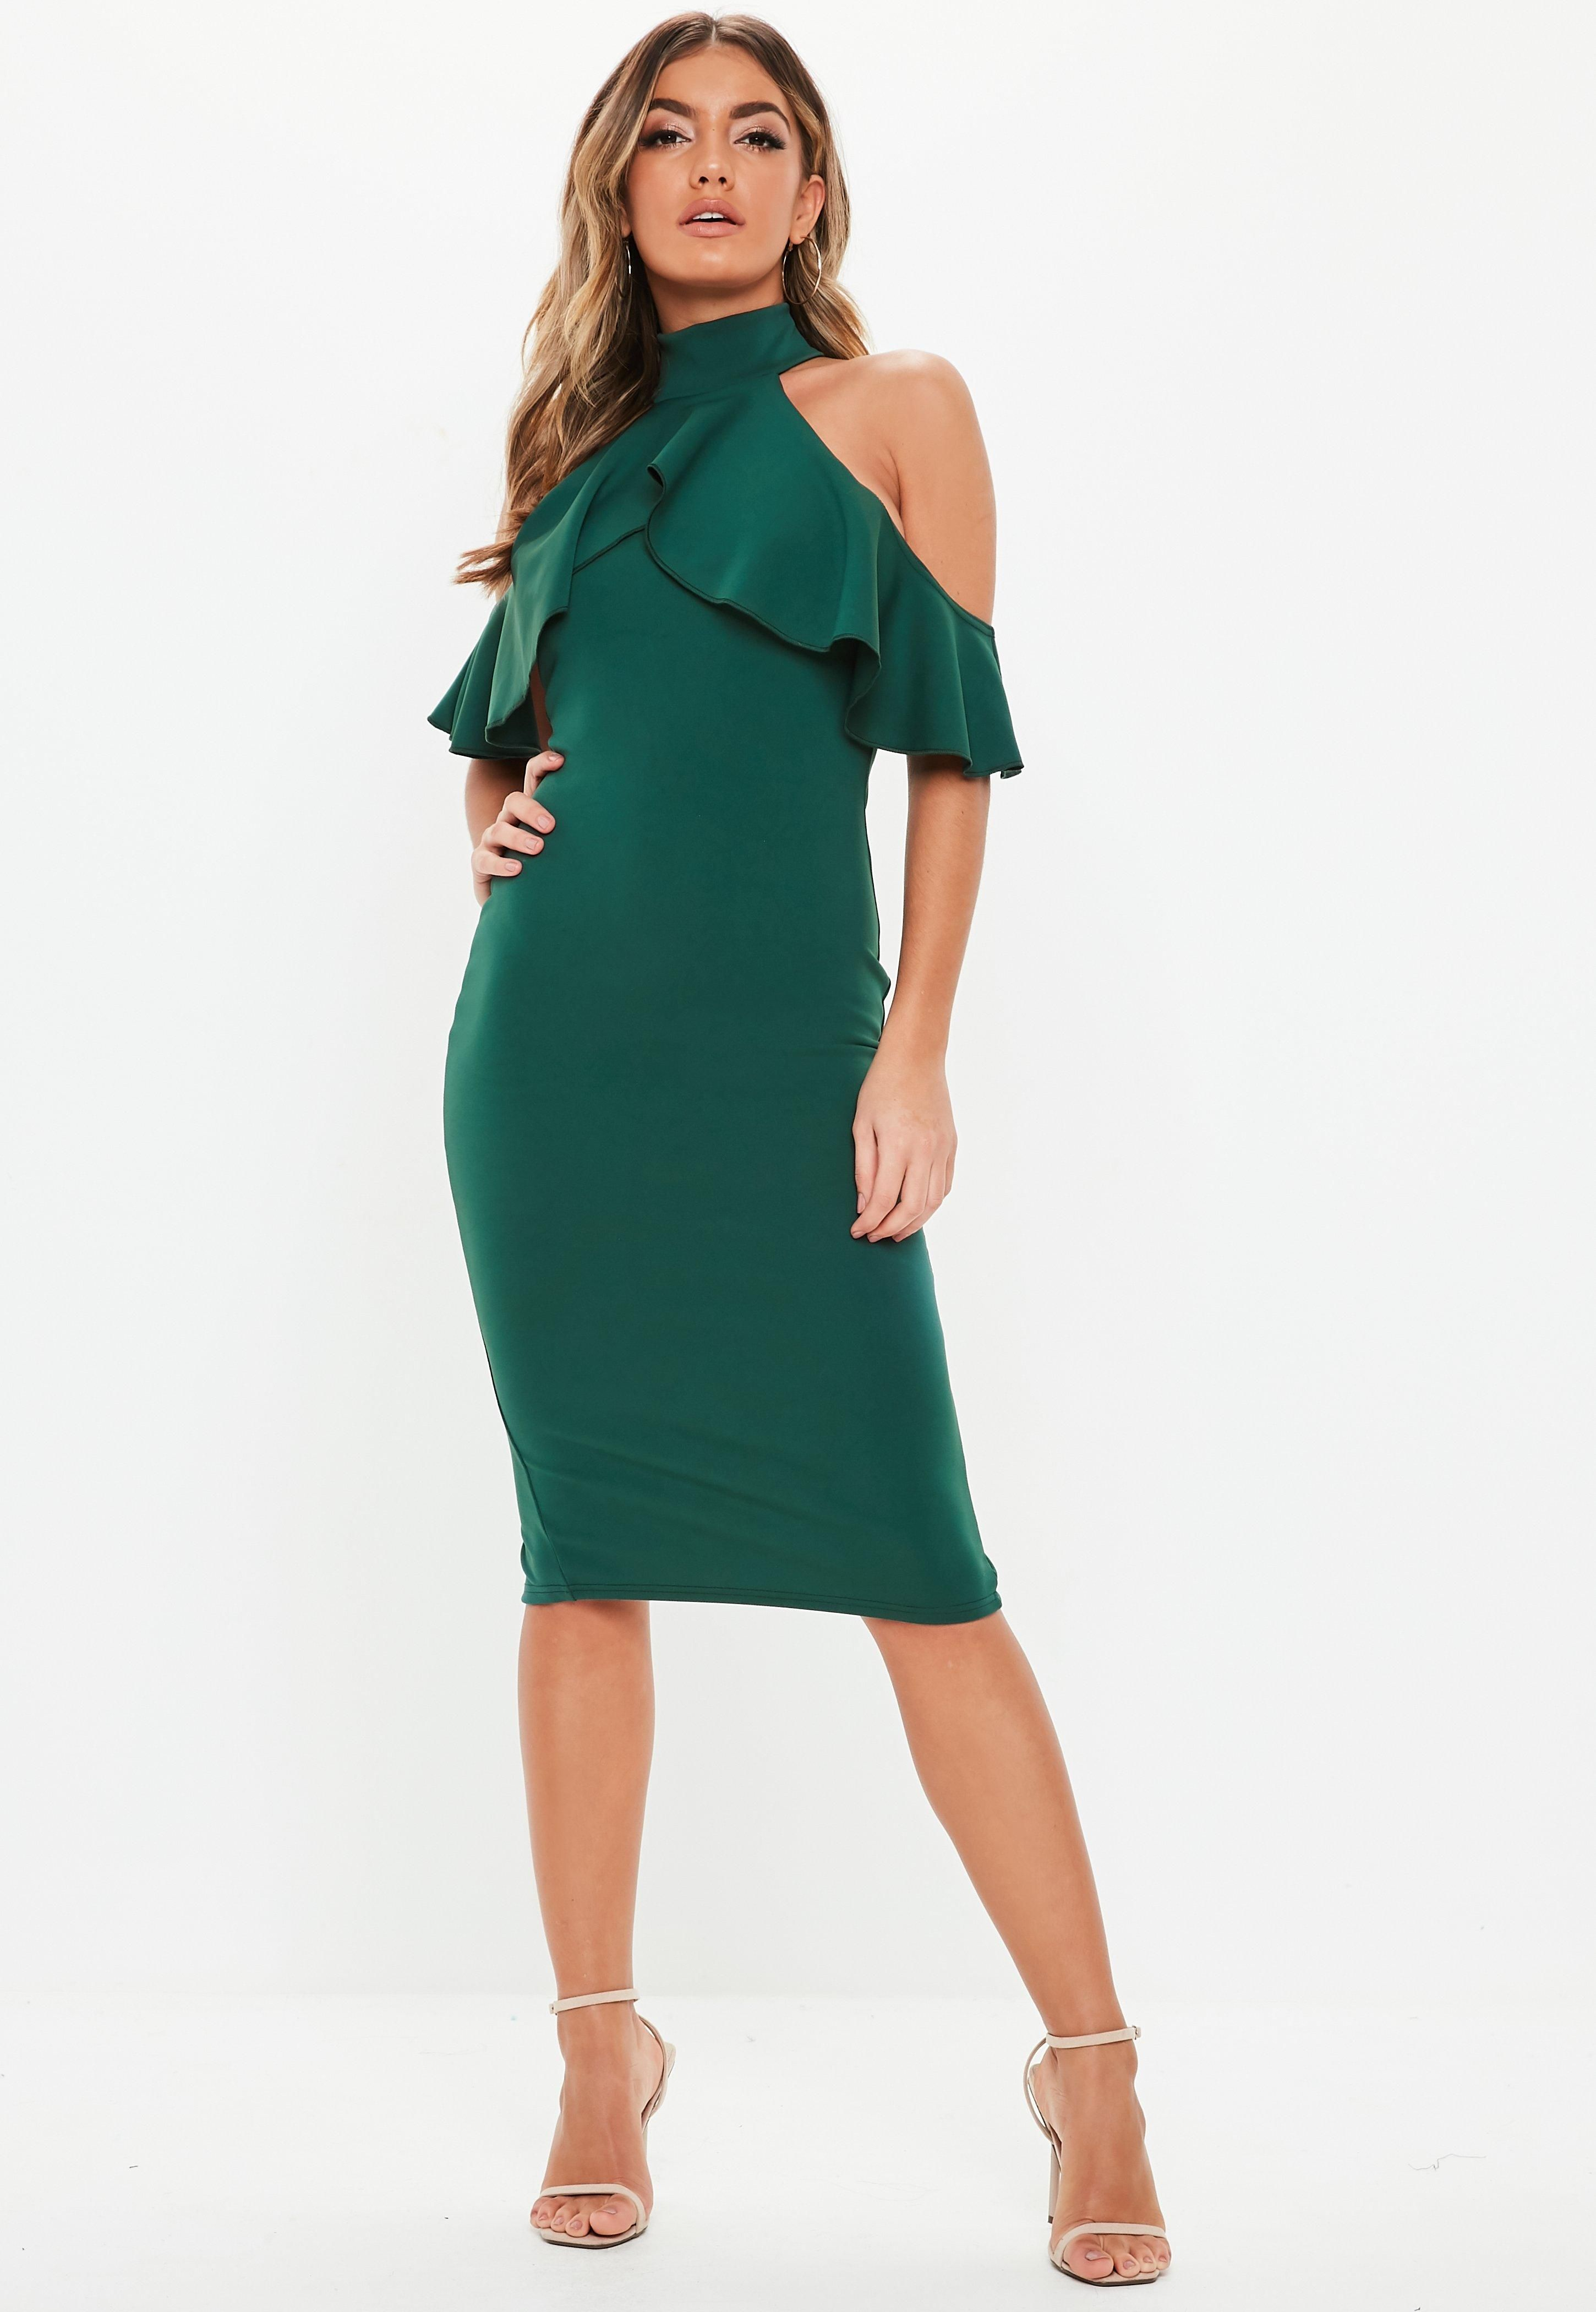 Green High Neck Frill Cold Shoulder Midi Dress Sponsored Neck Spon Frill Green Midi Ruffle Dress Midi Dress Bodycon Green Midi Dress